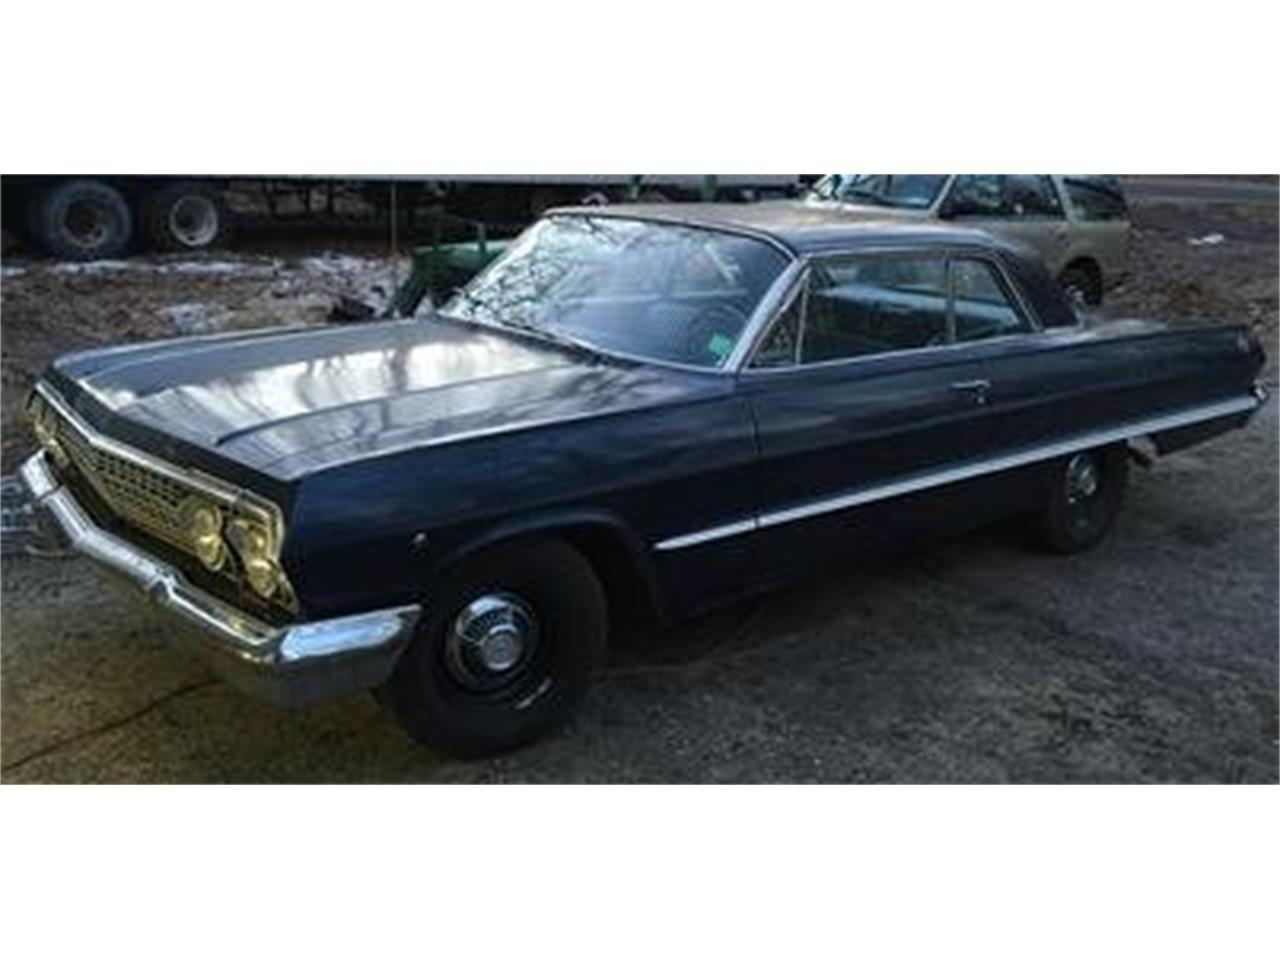 1963 Chevrolet Impala (CC-1308119) for sale in Holliston, Massachusetts